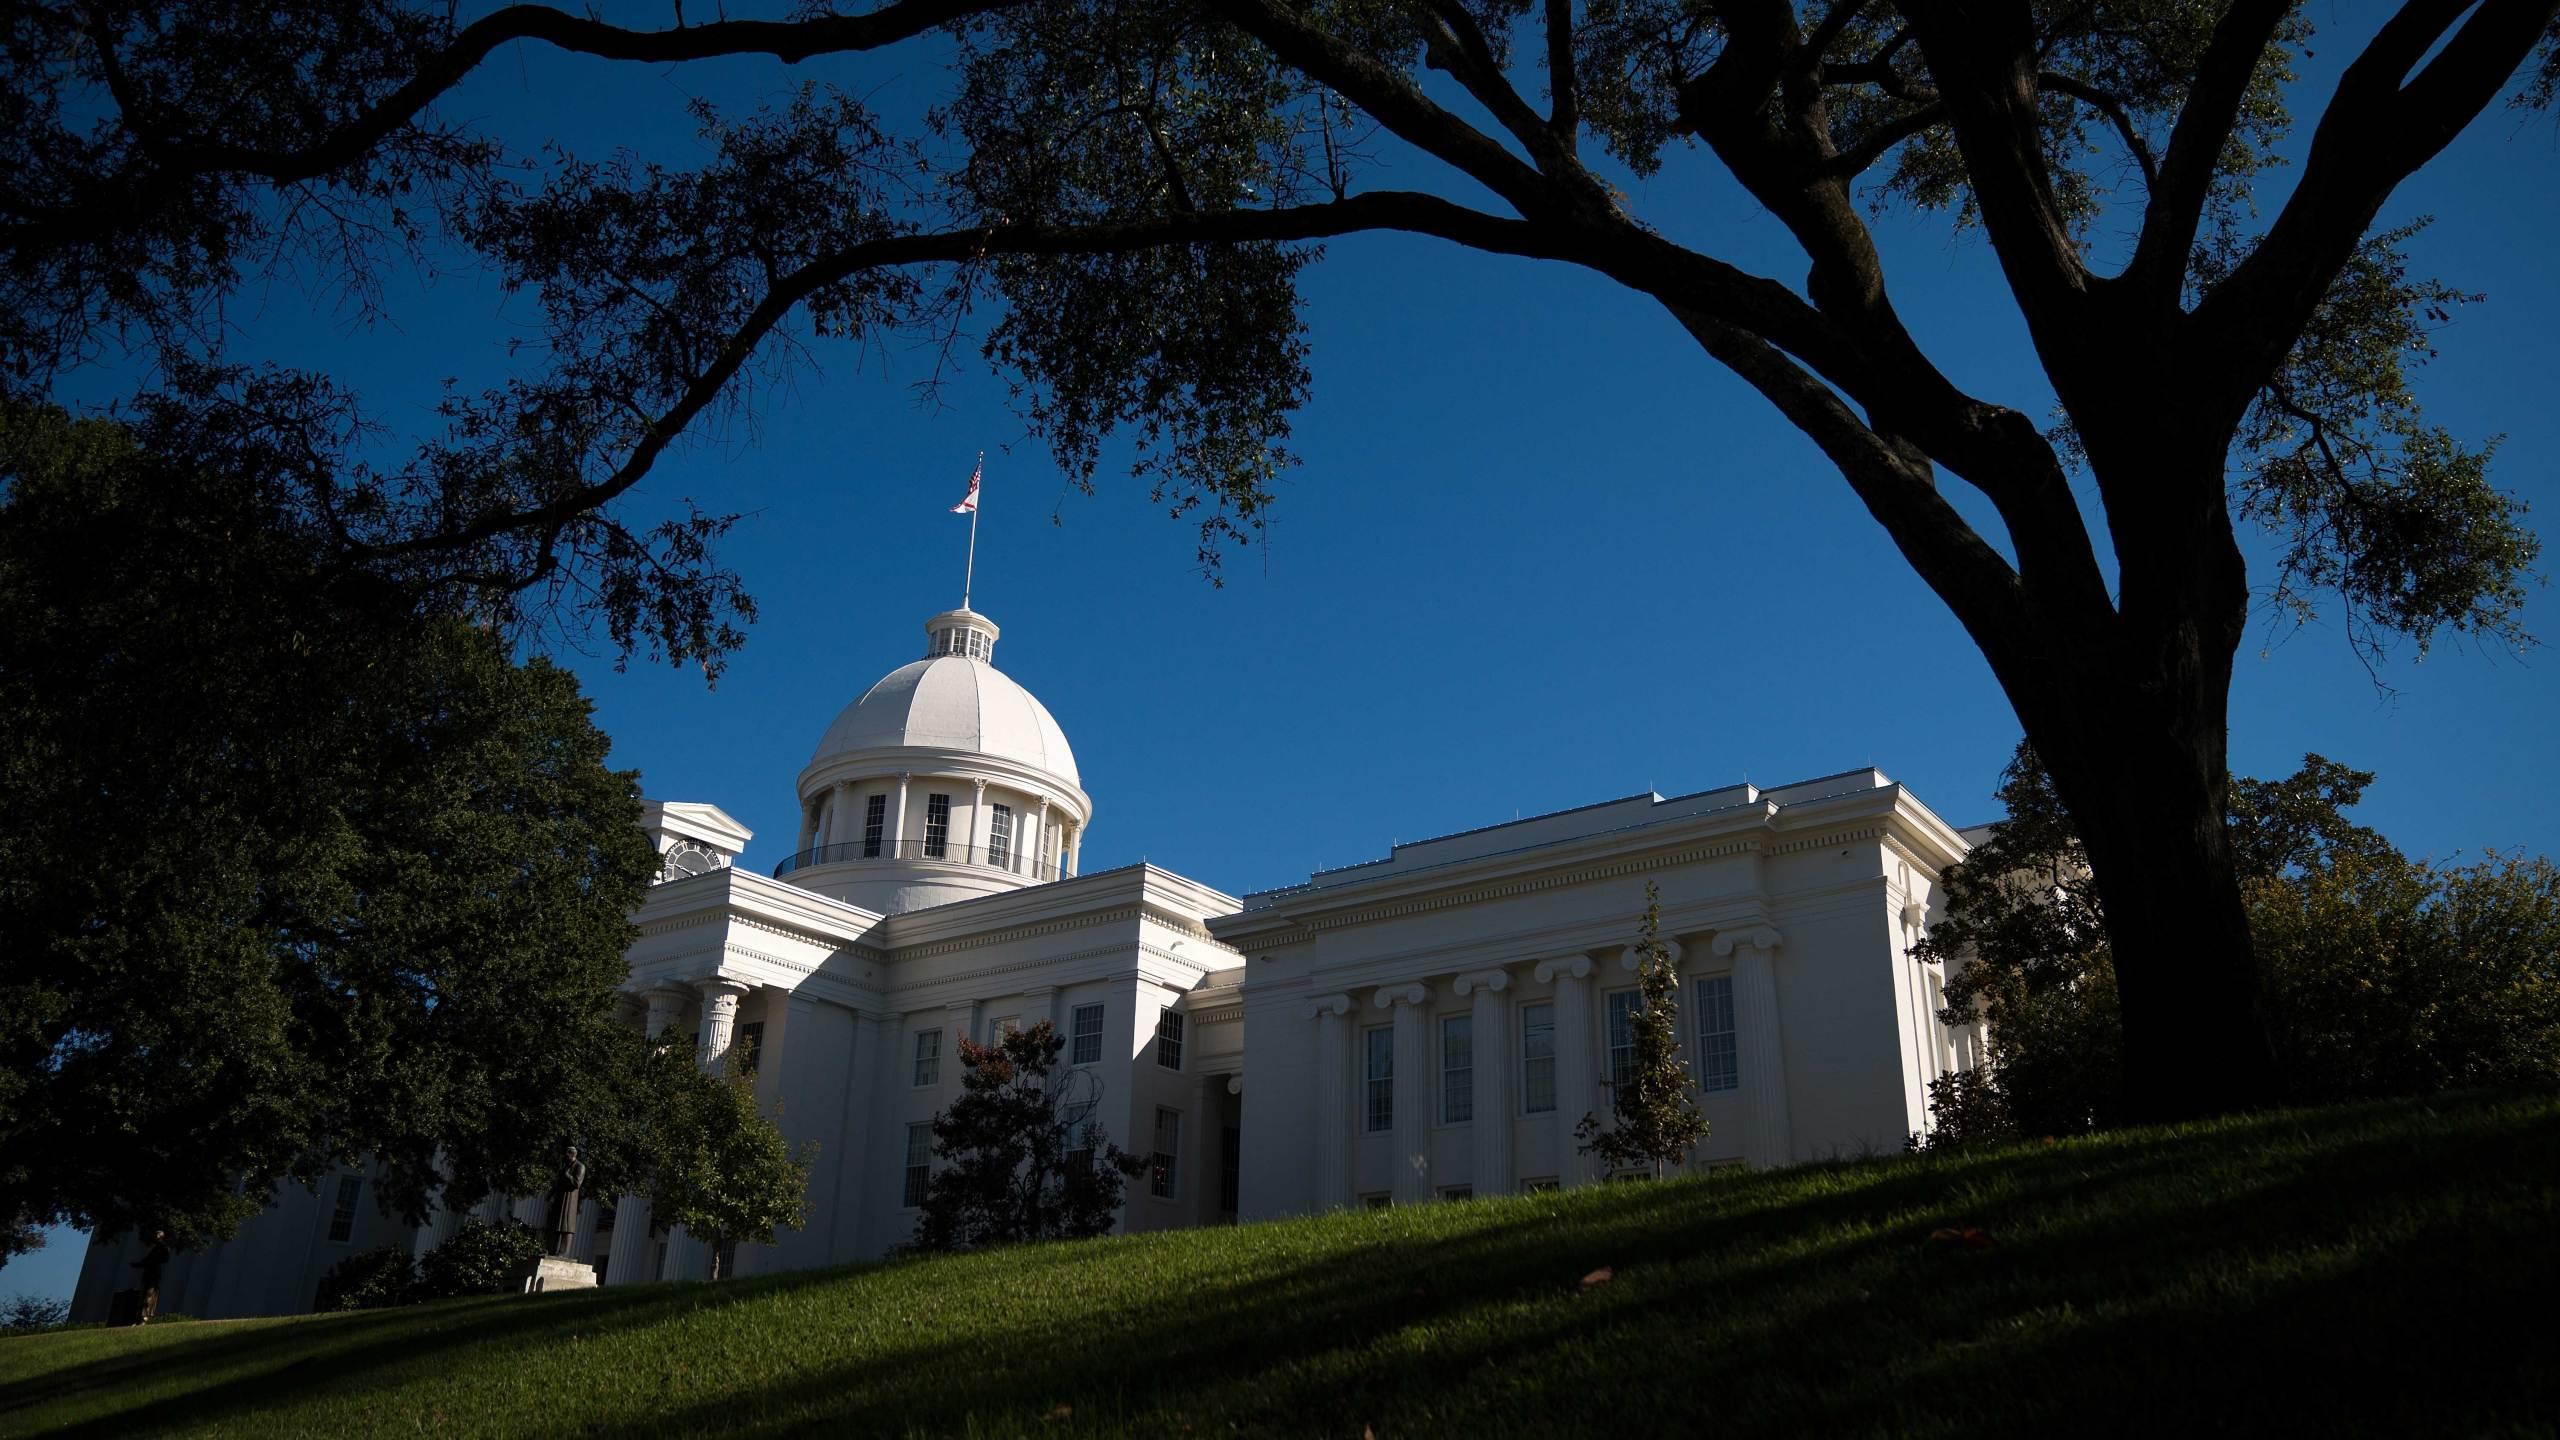 GettyImages-875397028-Montgomery-Alabama-capitol-building-election-resultd_1527262204438.jpg